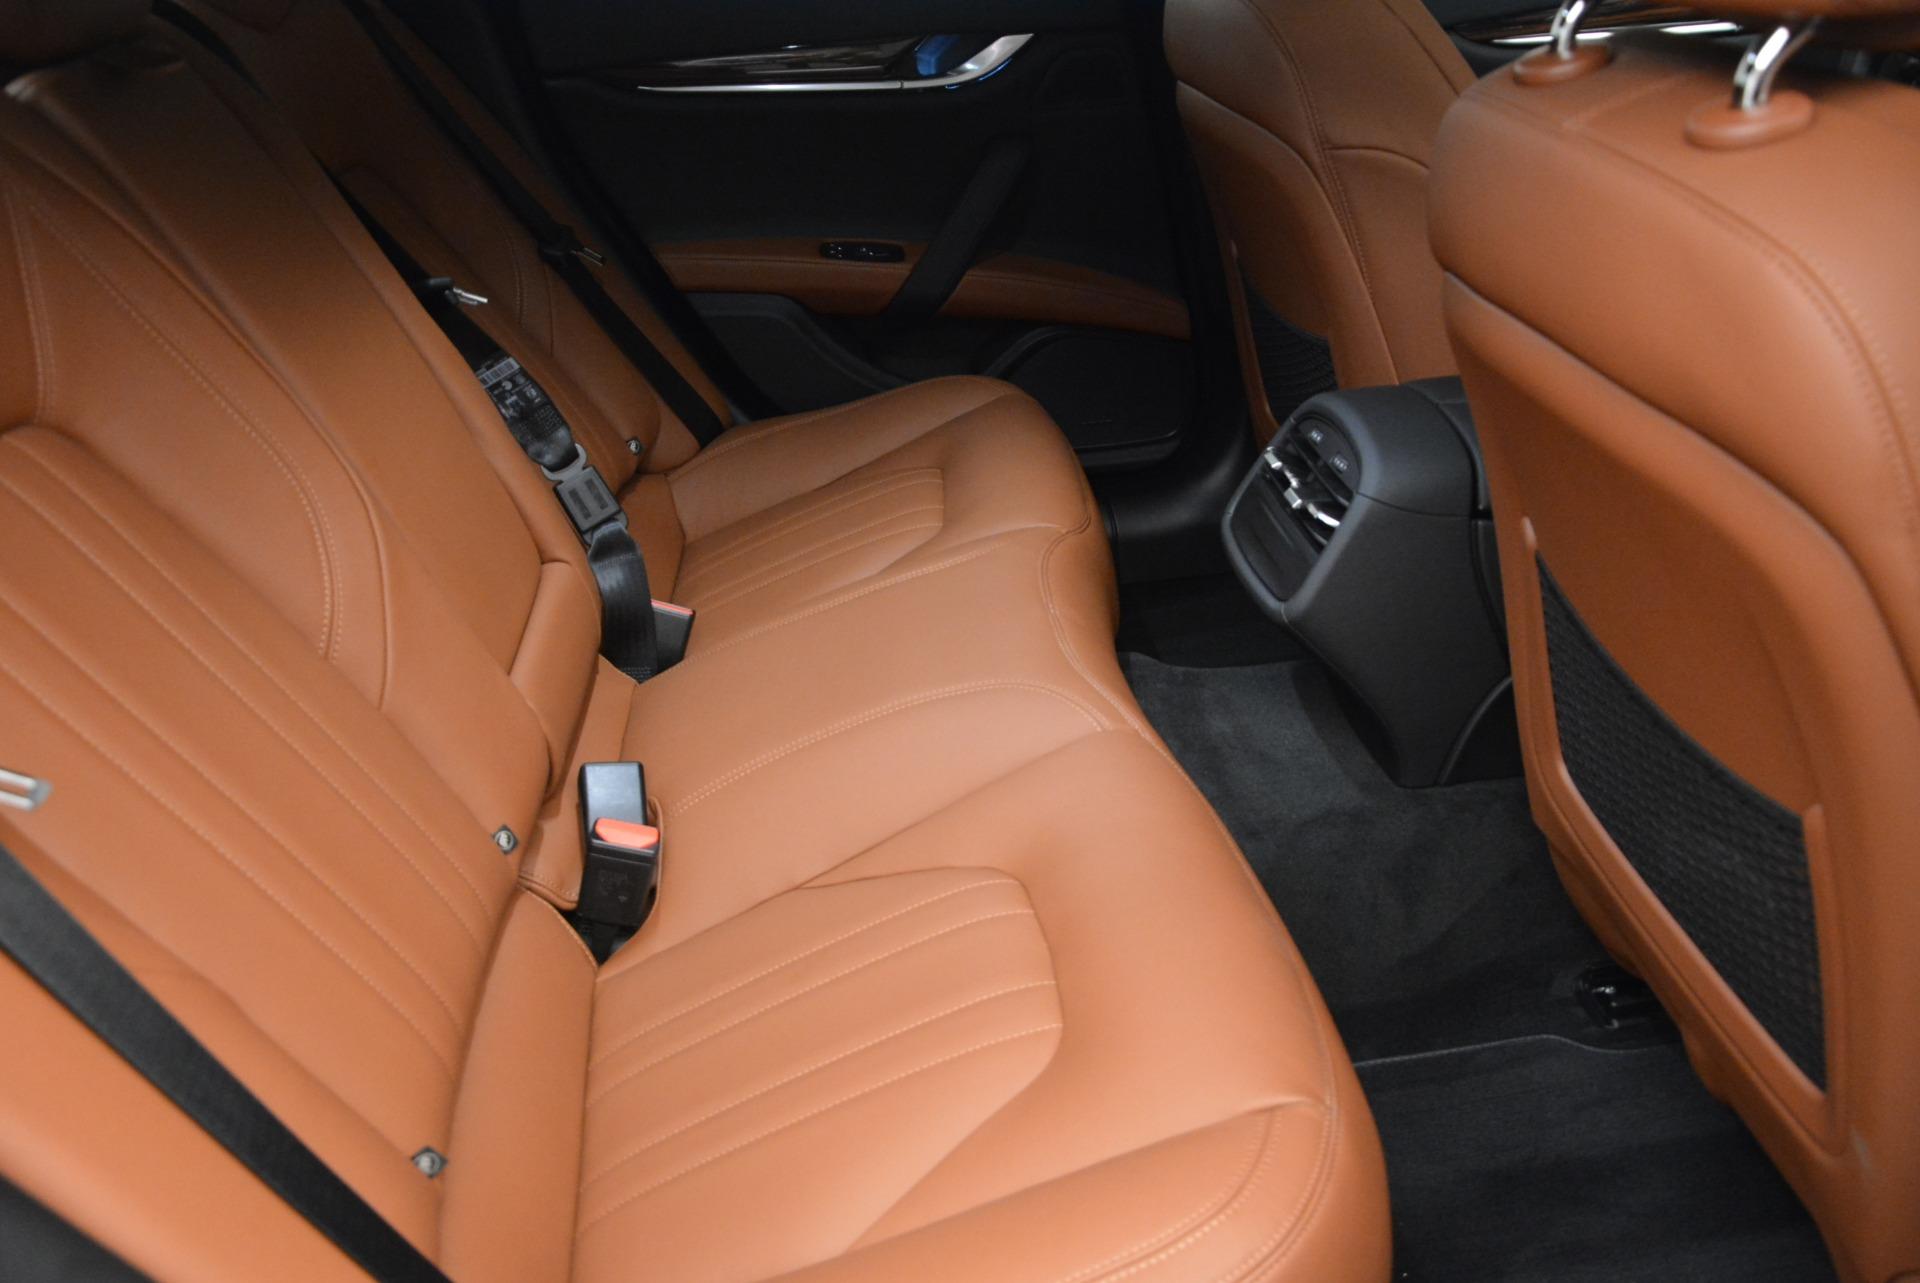 Used 2017 Maserati Ghibli S Q4 Ex-Loaner For Sale In Westport, CT 719_p24